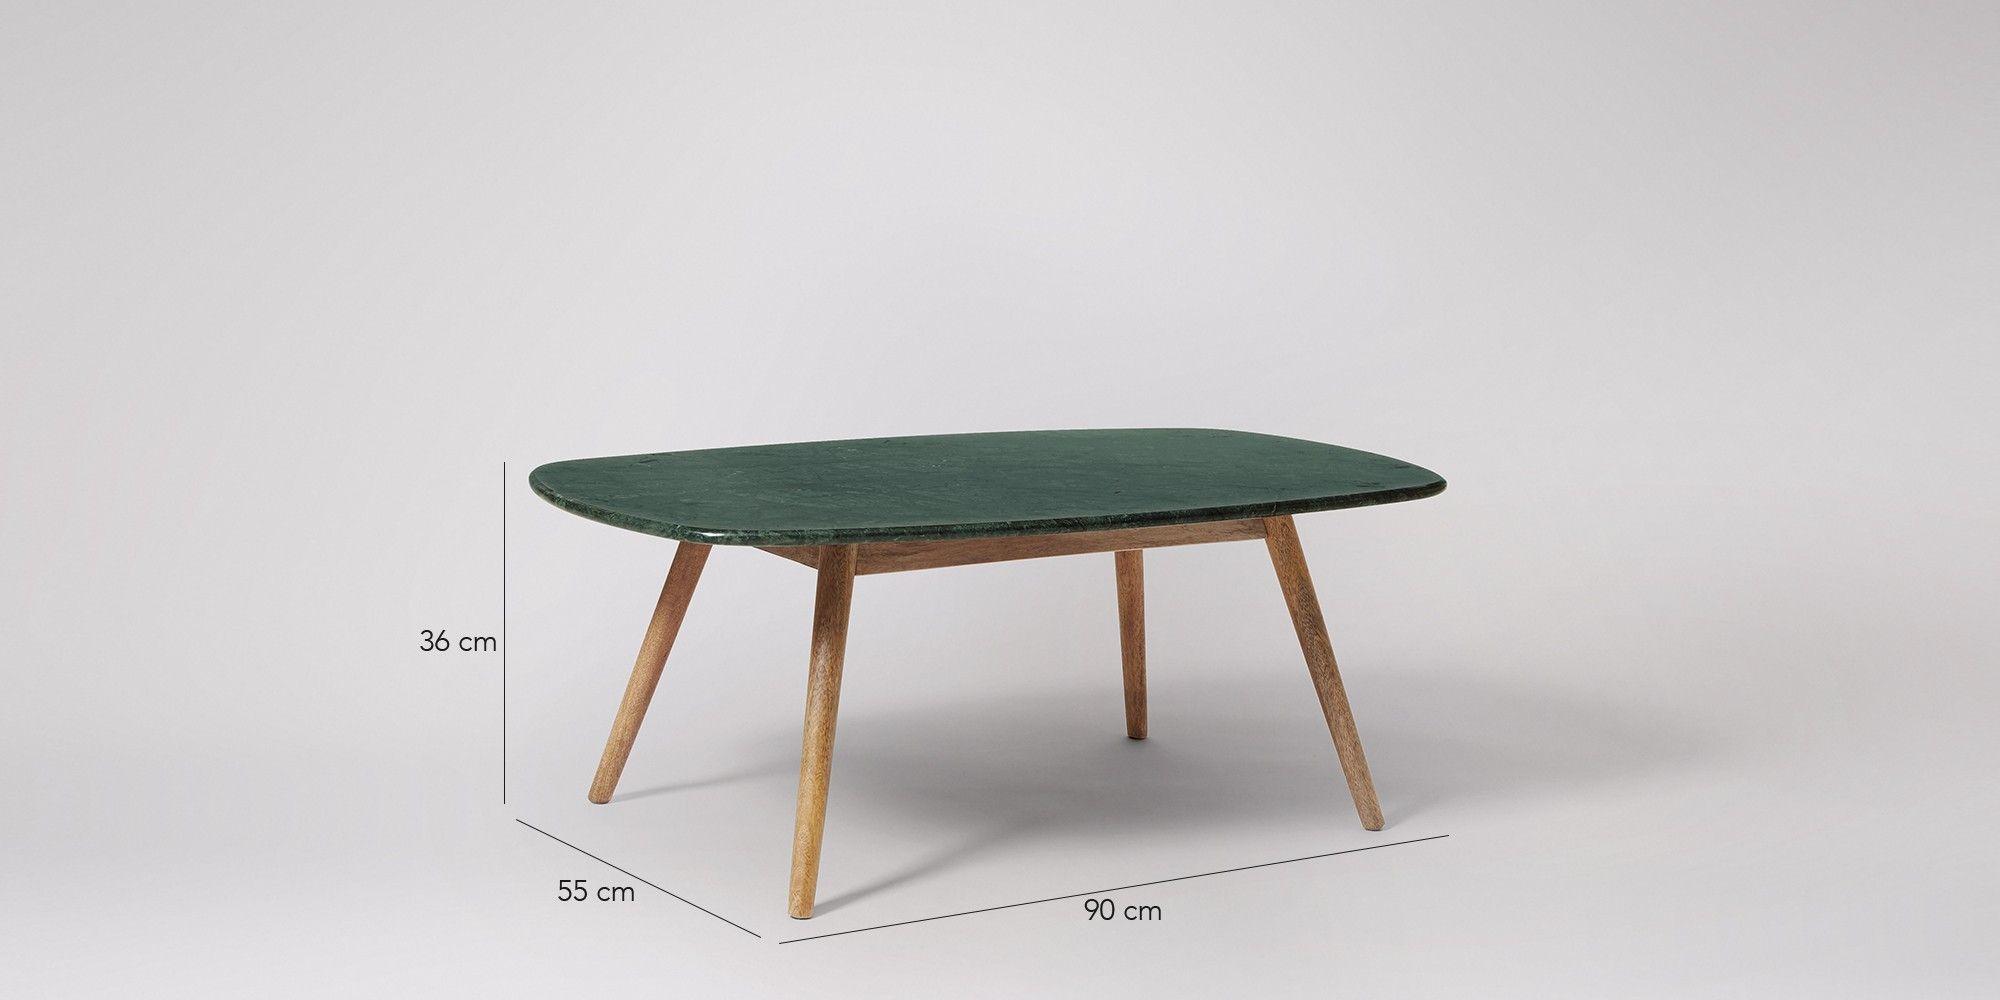 Kasper coffee table in mango wood and green marble